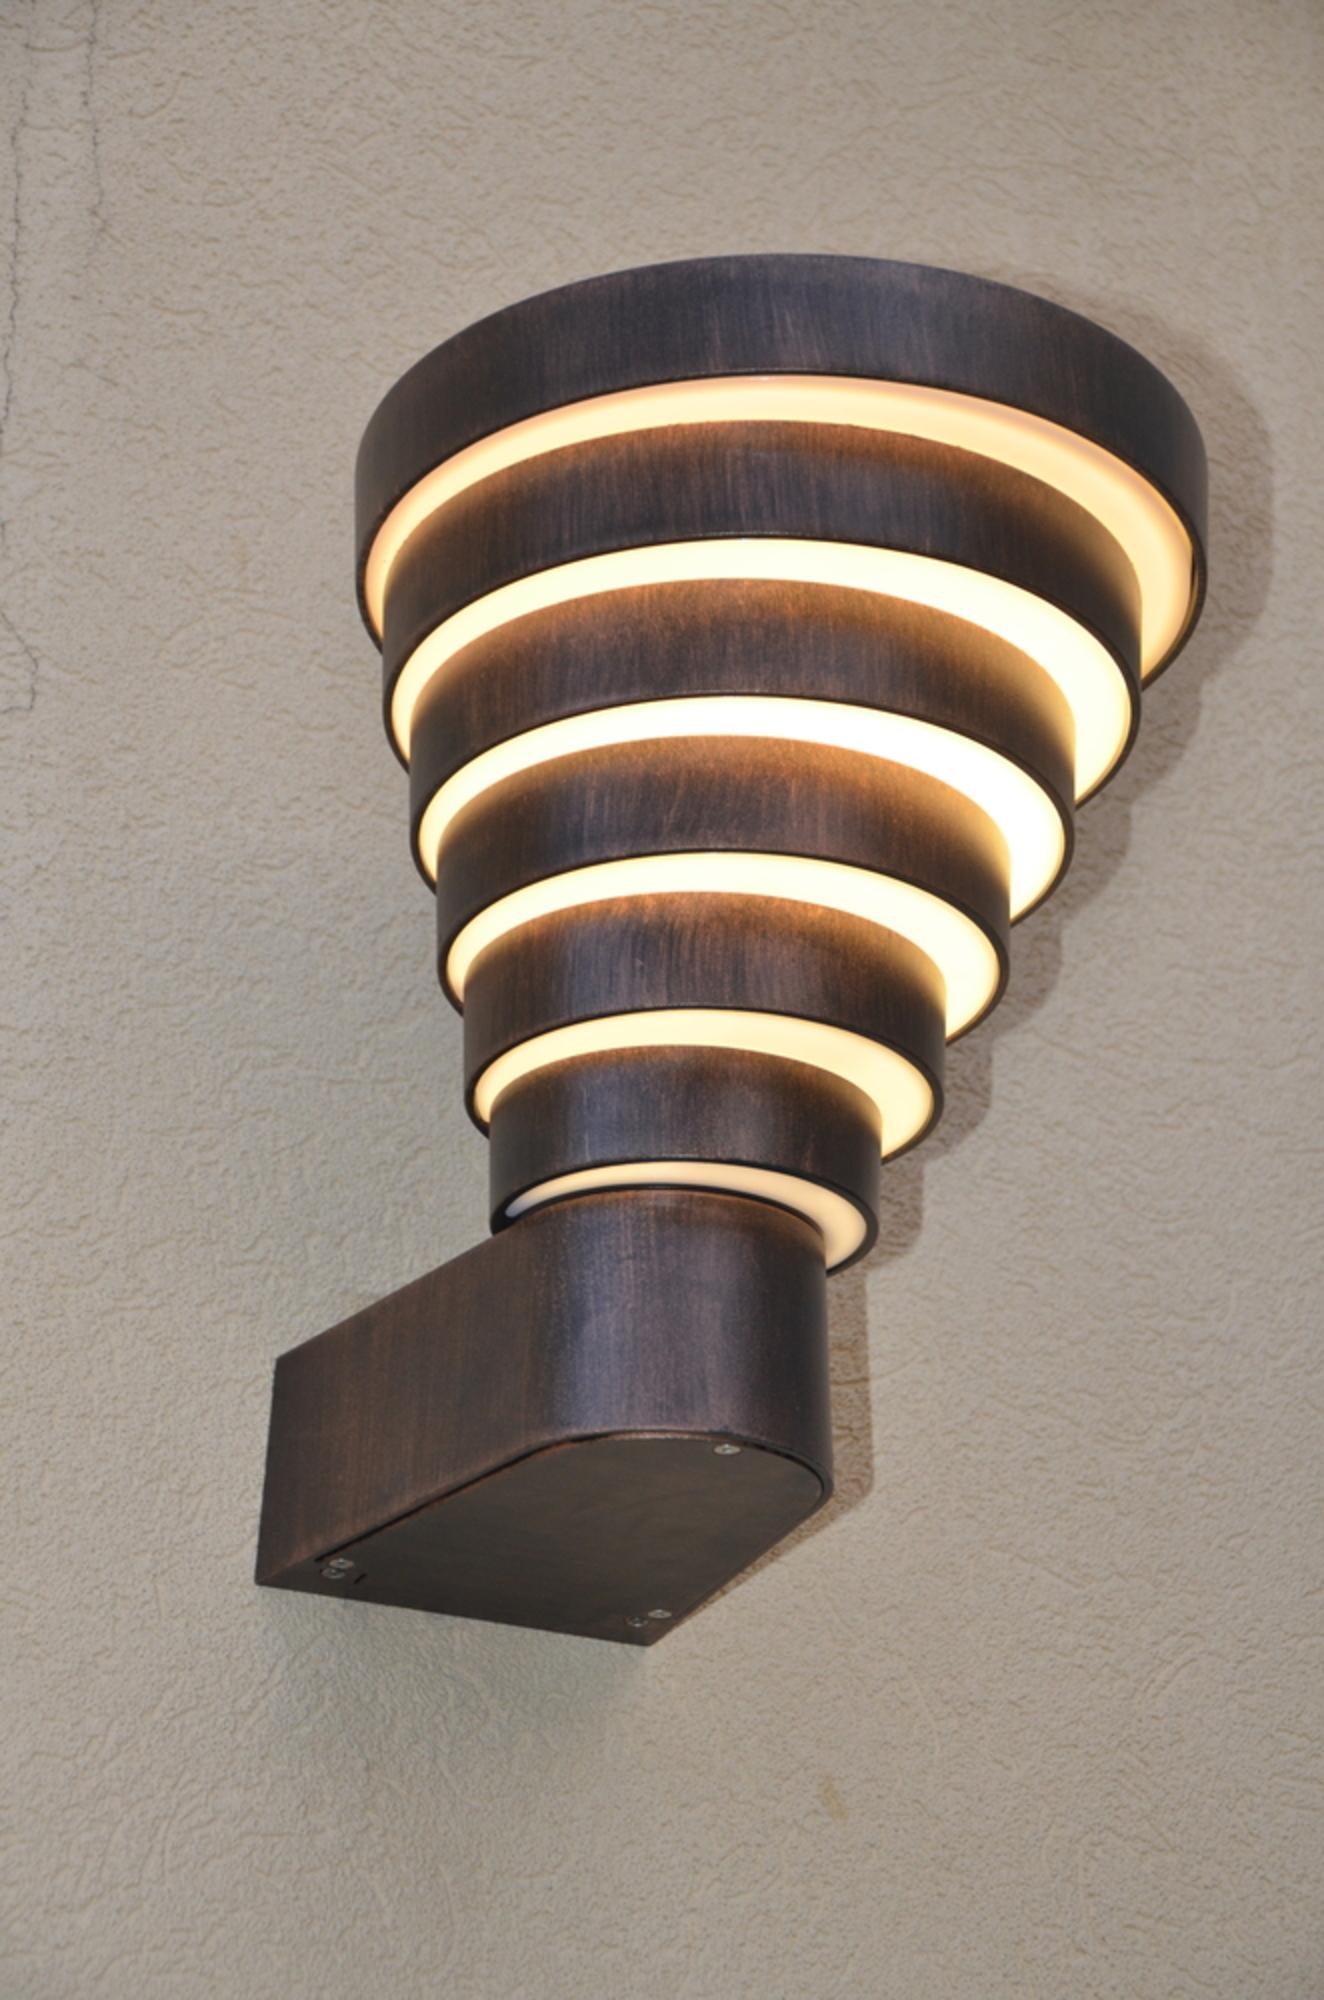 Ivan Hoe, a decorative light from Landa Lighting